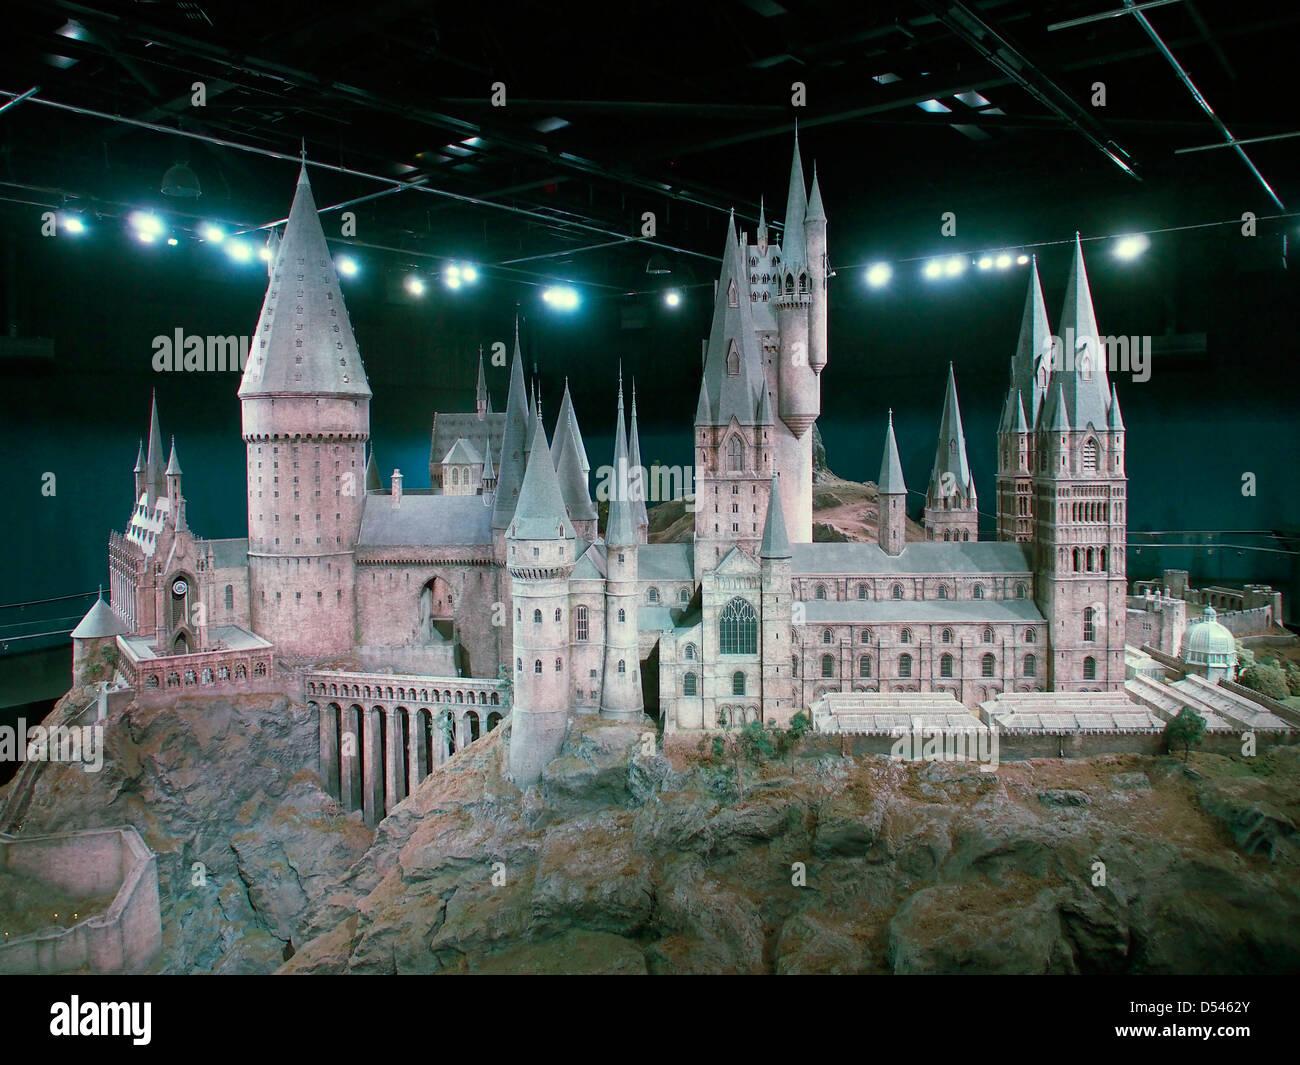 Model of Hogwarts Castle on the Warner Brothers Studio UK. The making of Harry Potter back lot tour - Stock Image